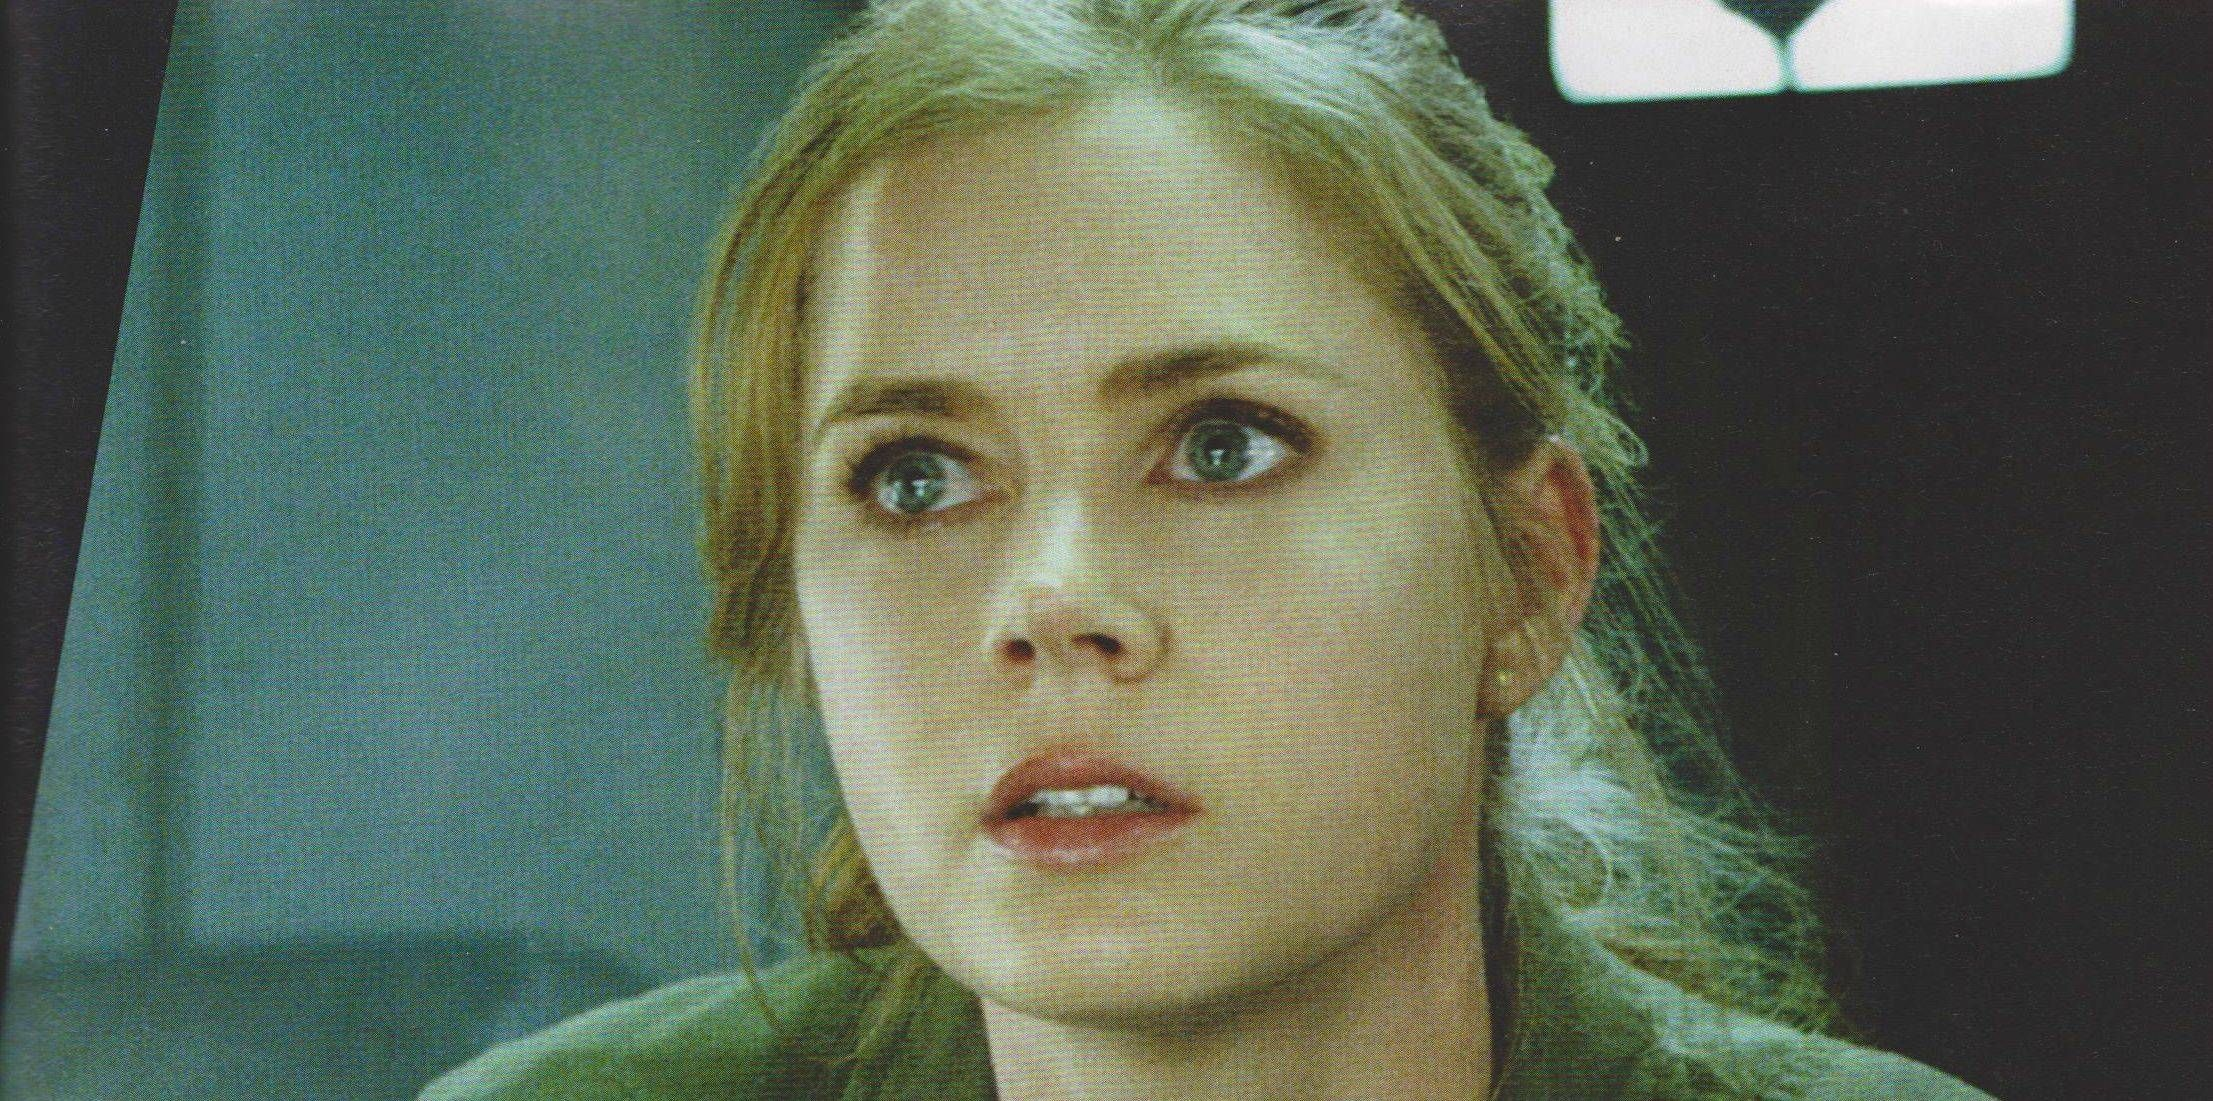 Forum on this topic: Ana Mulvoy-Ten (born 1992), charlotte-kemp-muhl/